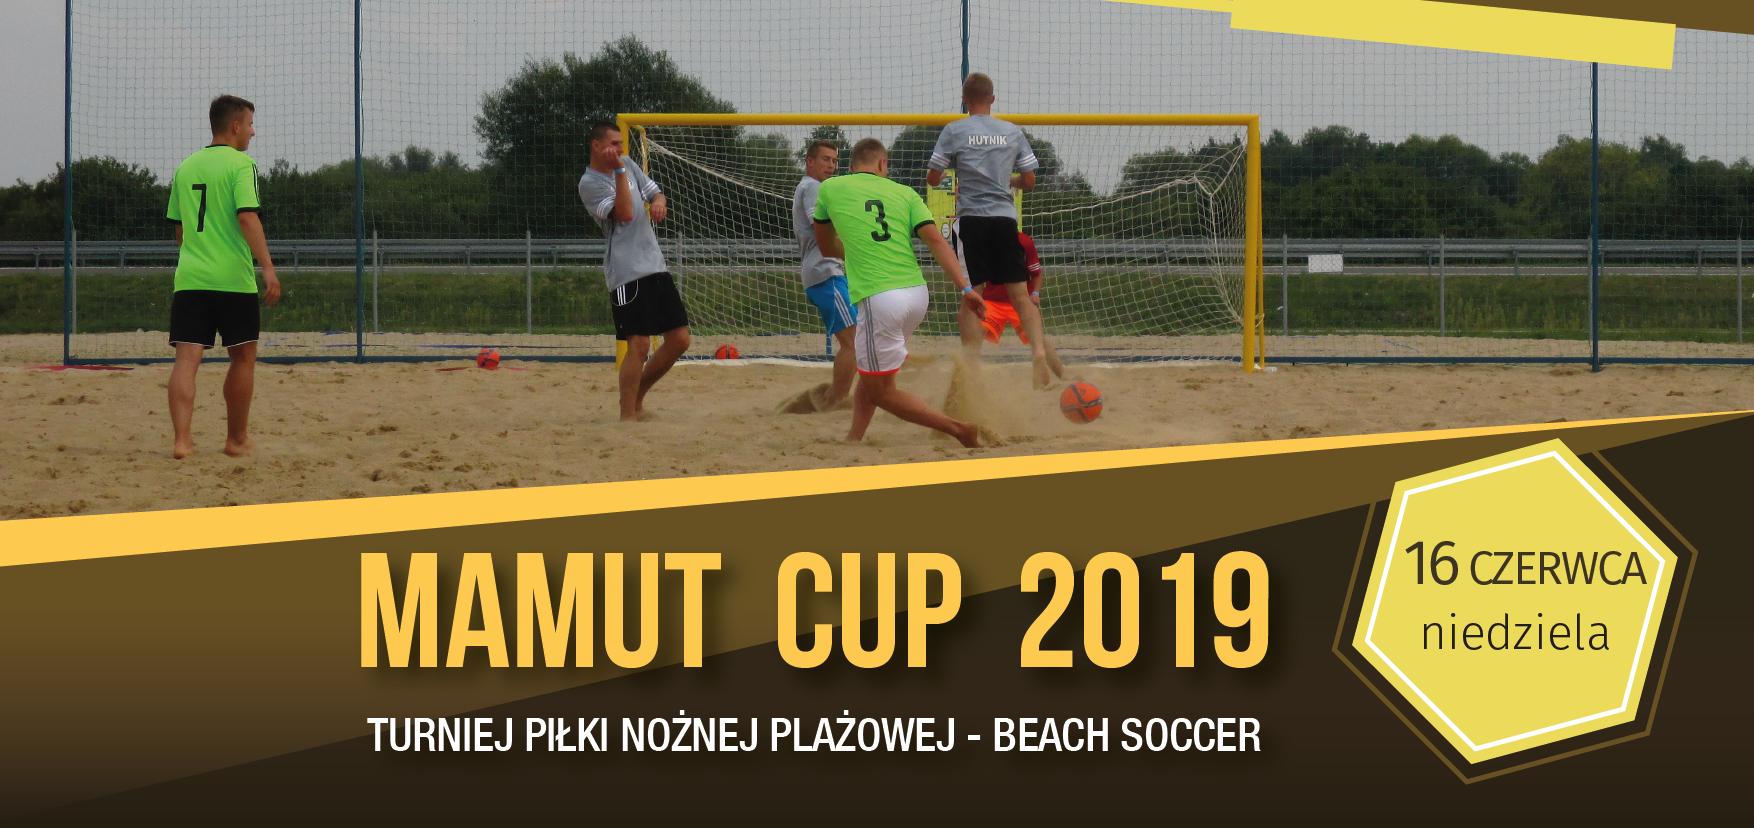 MAMUT CUP 2019 – nowy termin turnieju